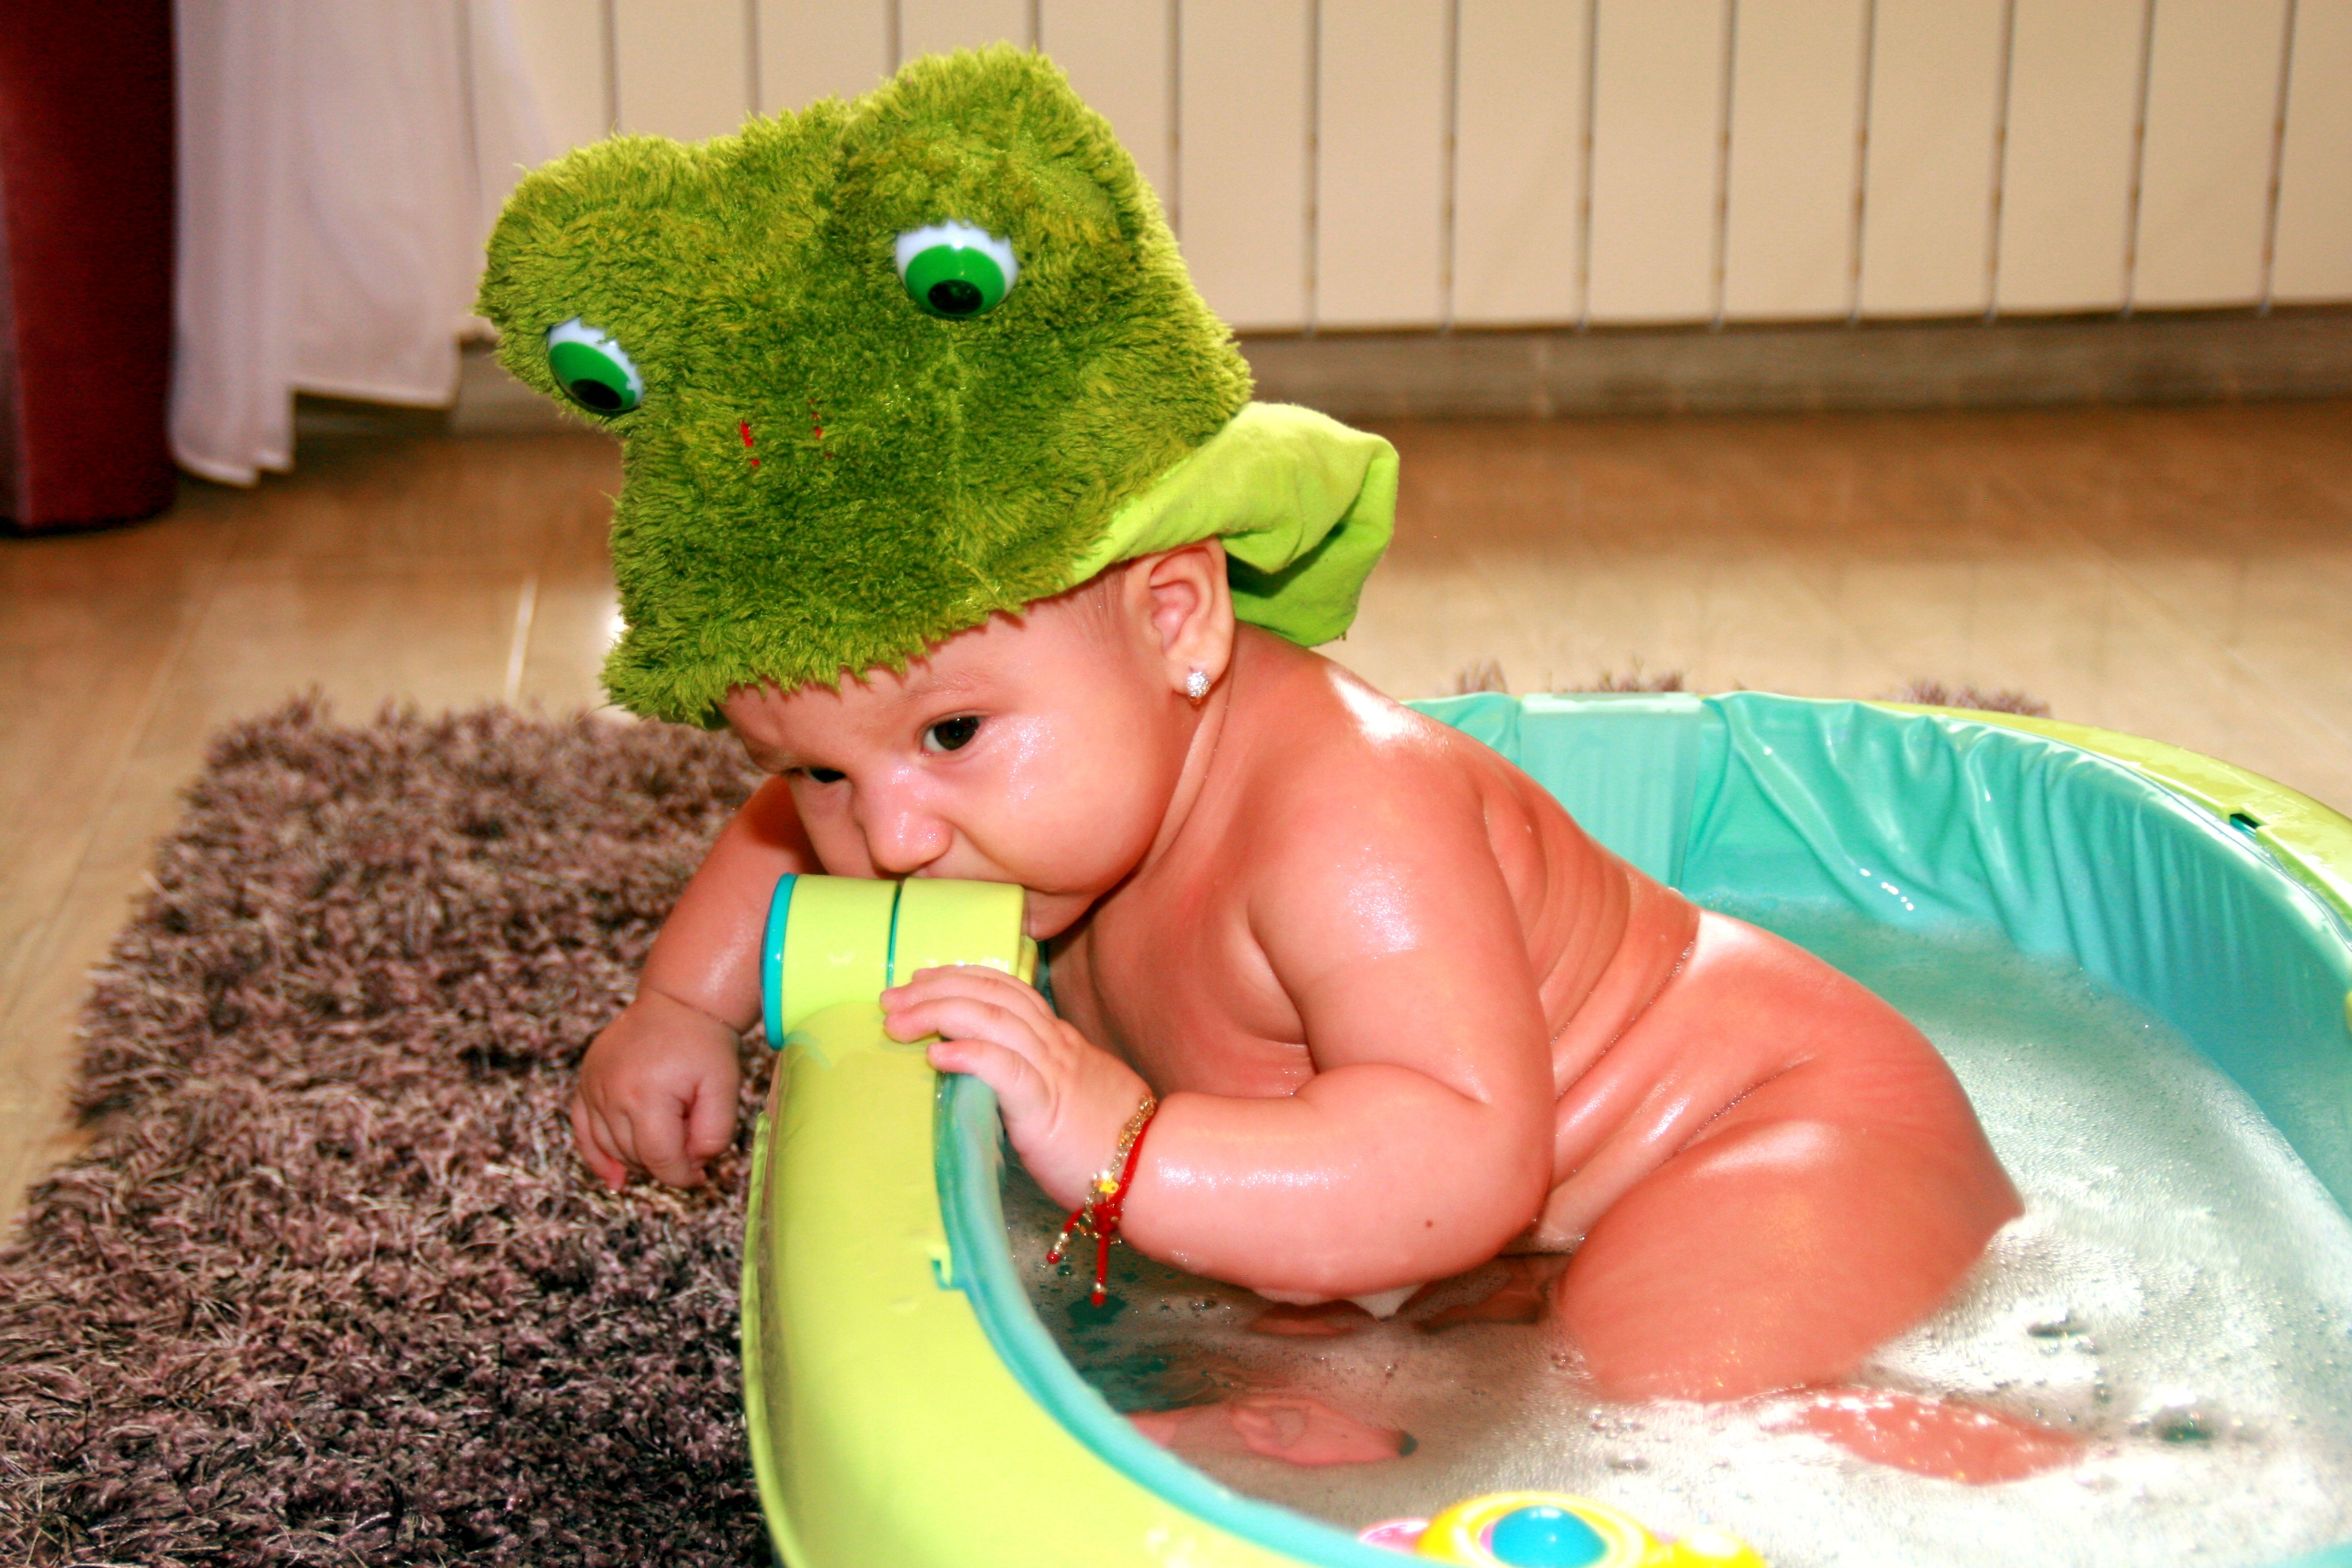 Taking bath photo